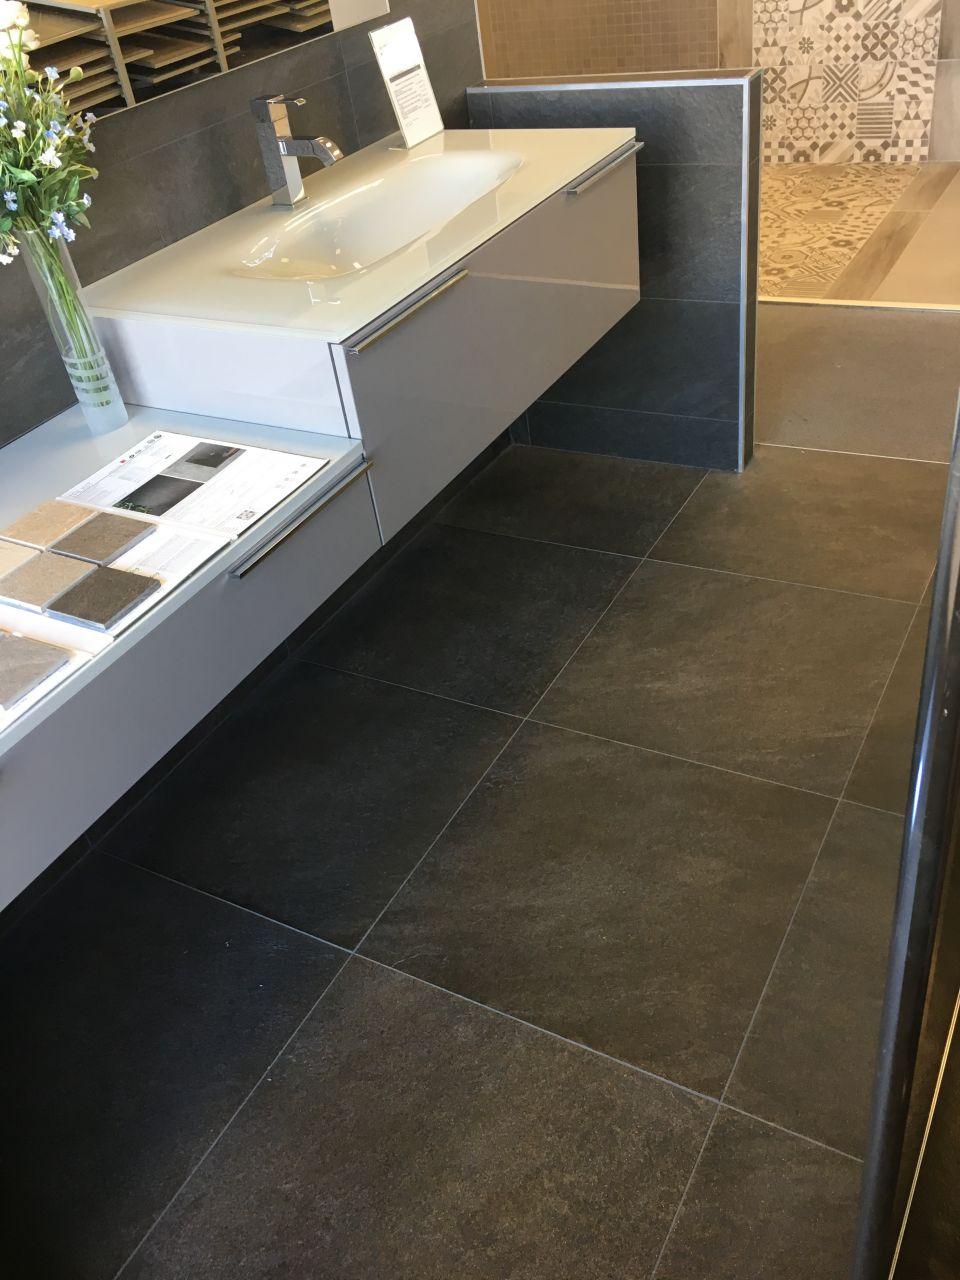 salle de bain 7m2 enchanteur plan salle de bain m avec plan salle de bain conkirafes und avec. Black Bedroom Furniture Sets. Home Design Ideas